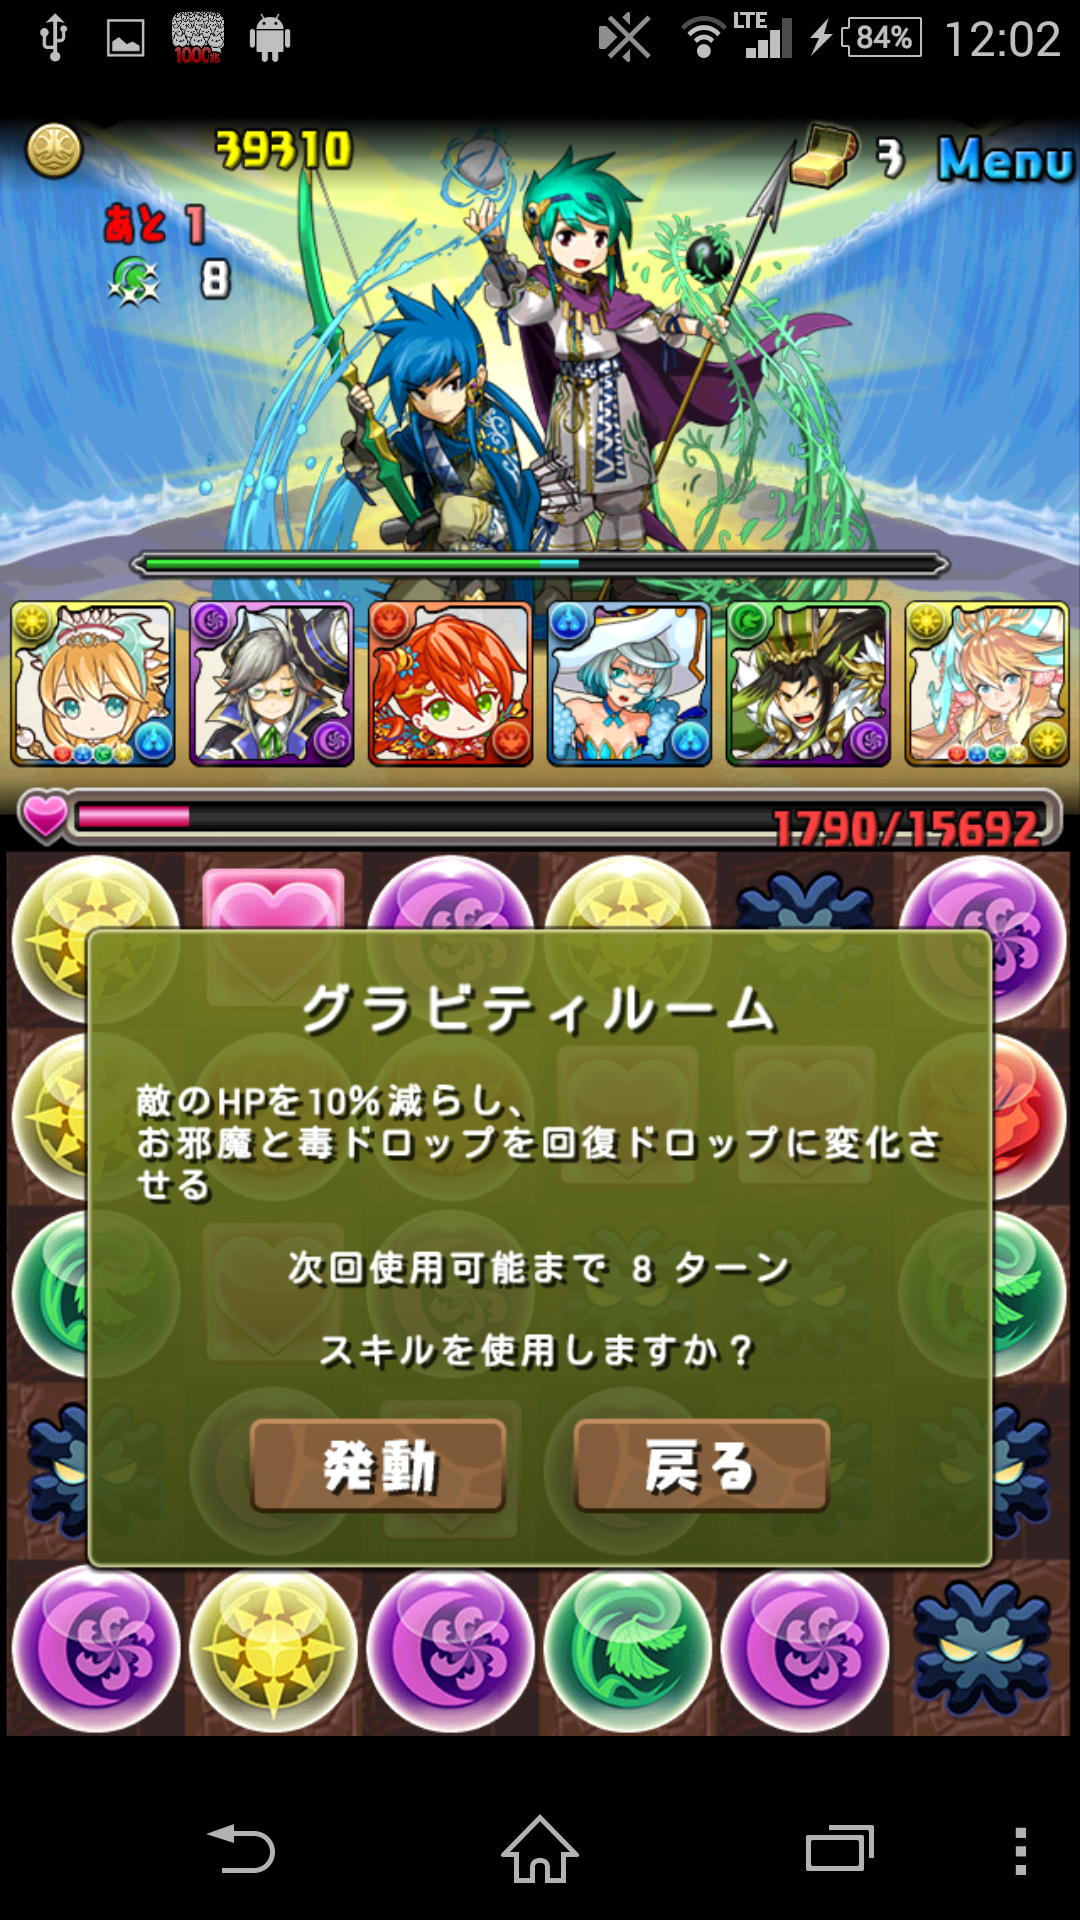 Screenshot_2015-01-03-12-02-59.png